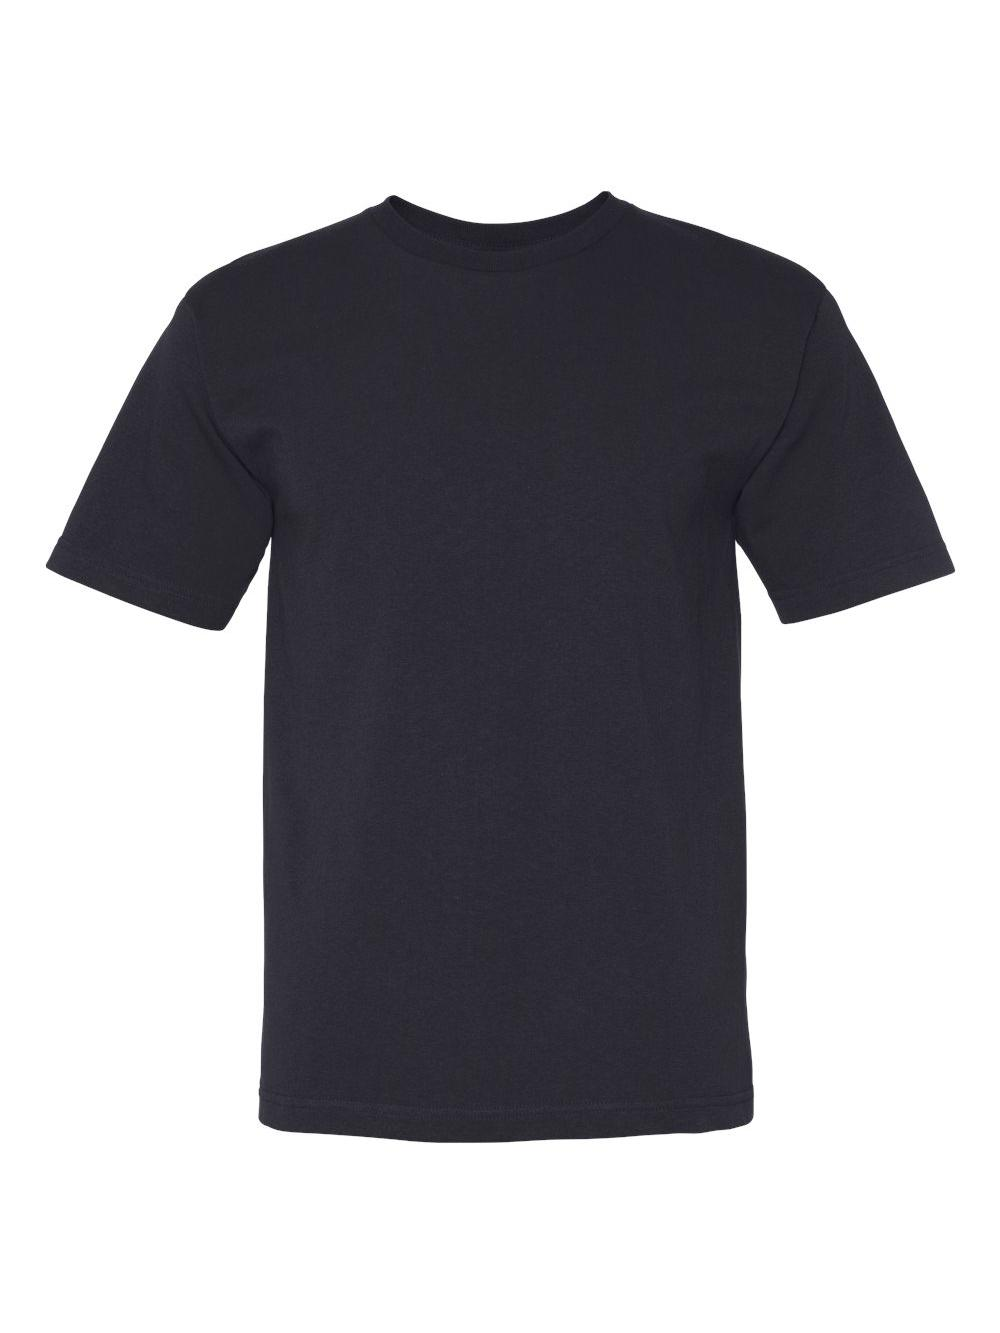 Bayside-USA-Made-100-Cotton-Short-Sleeve-T-Shirt-5040 thumbnail 24